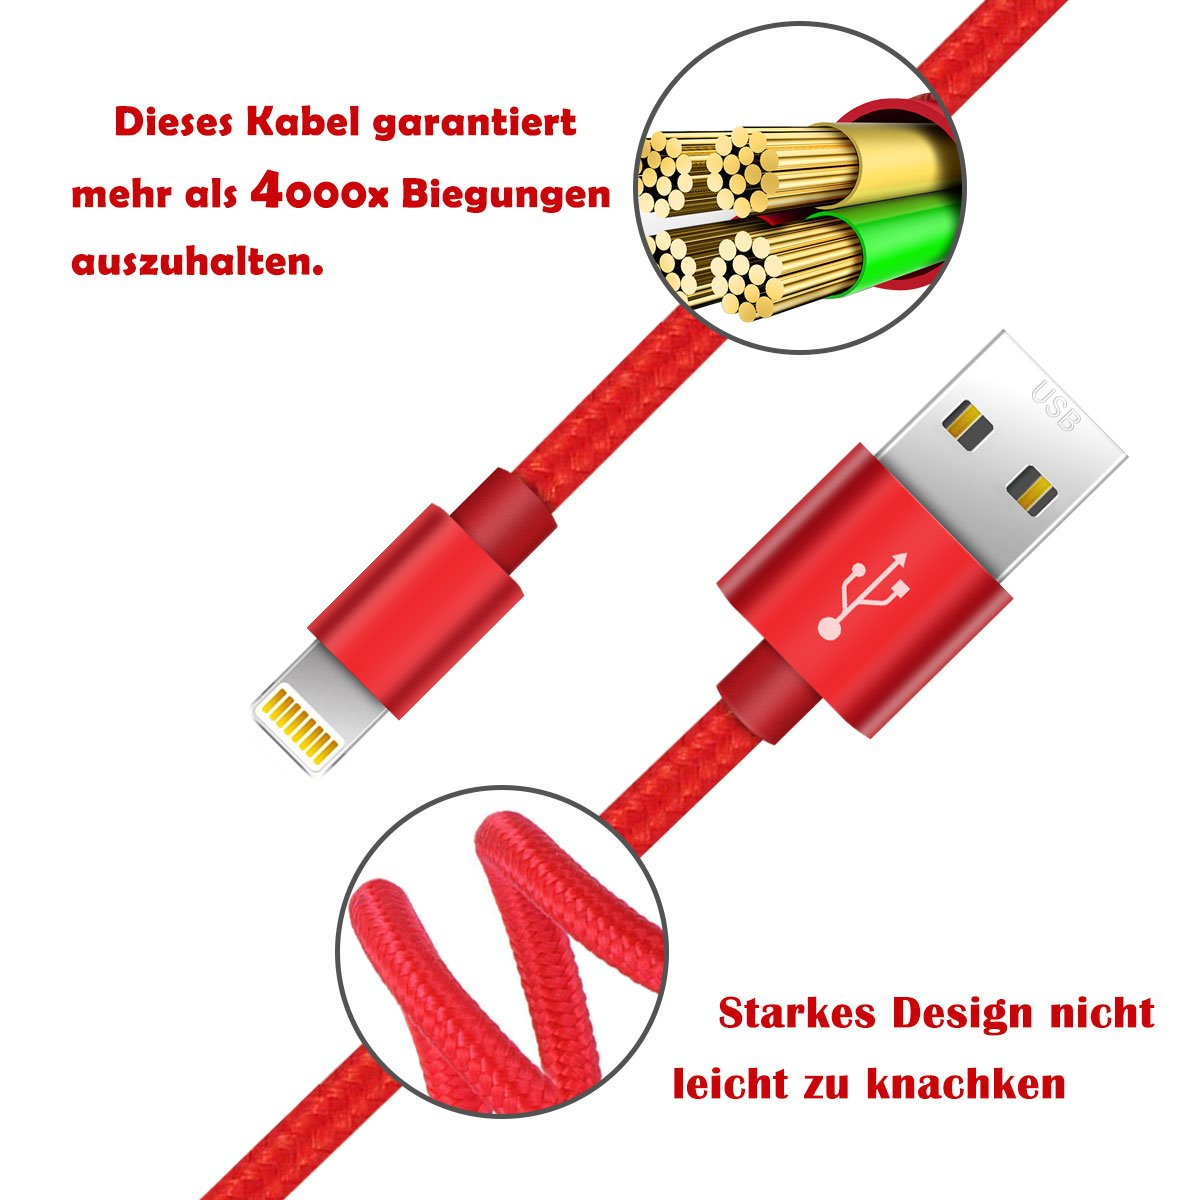 Zeuste Nylon Kabel 4*1.5m iPhone Ladekabel: Amazon.de: Elektronik